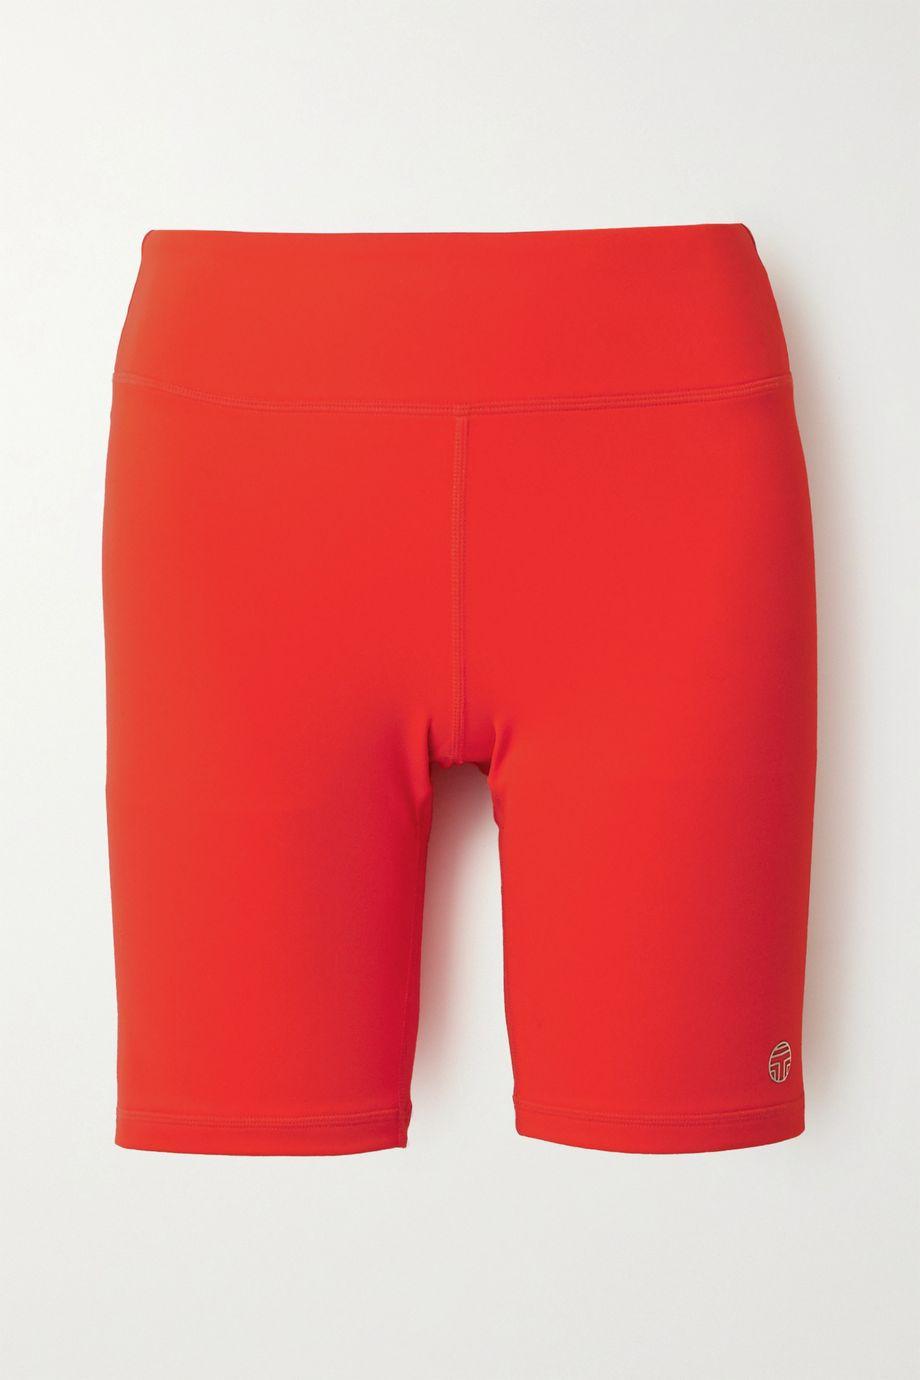 Tory Sport Stretch-Tactel shorts